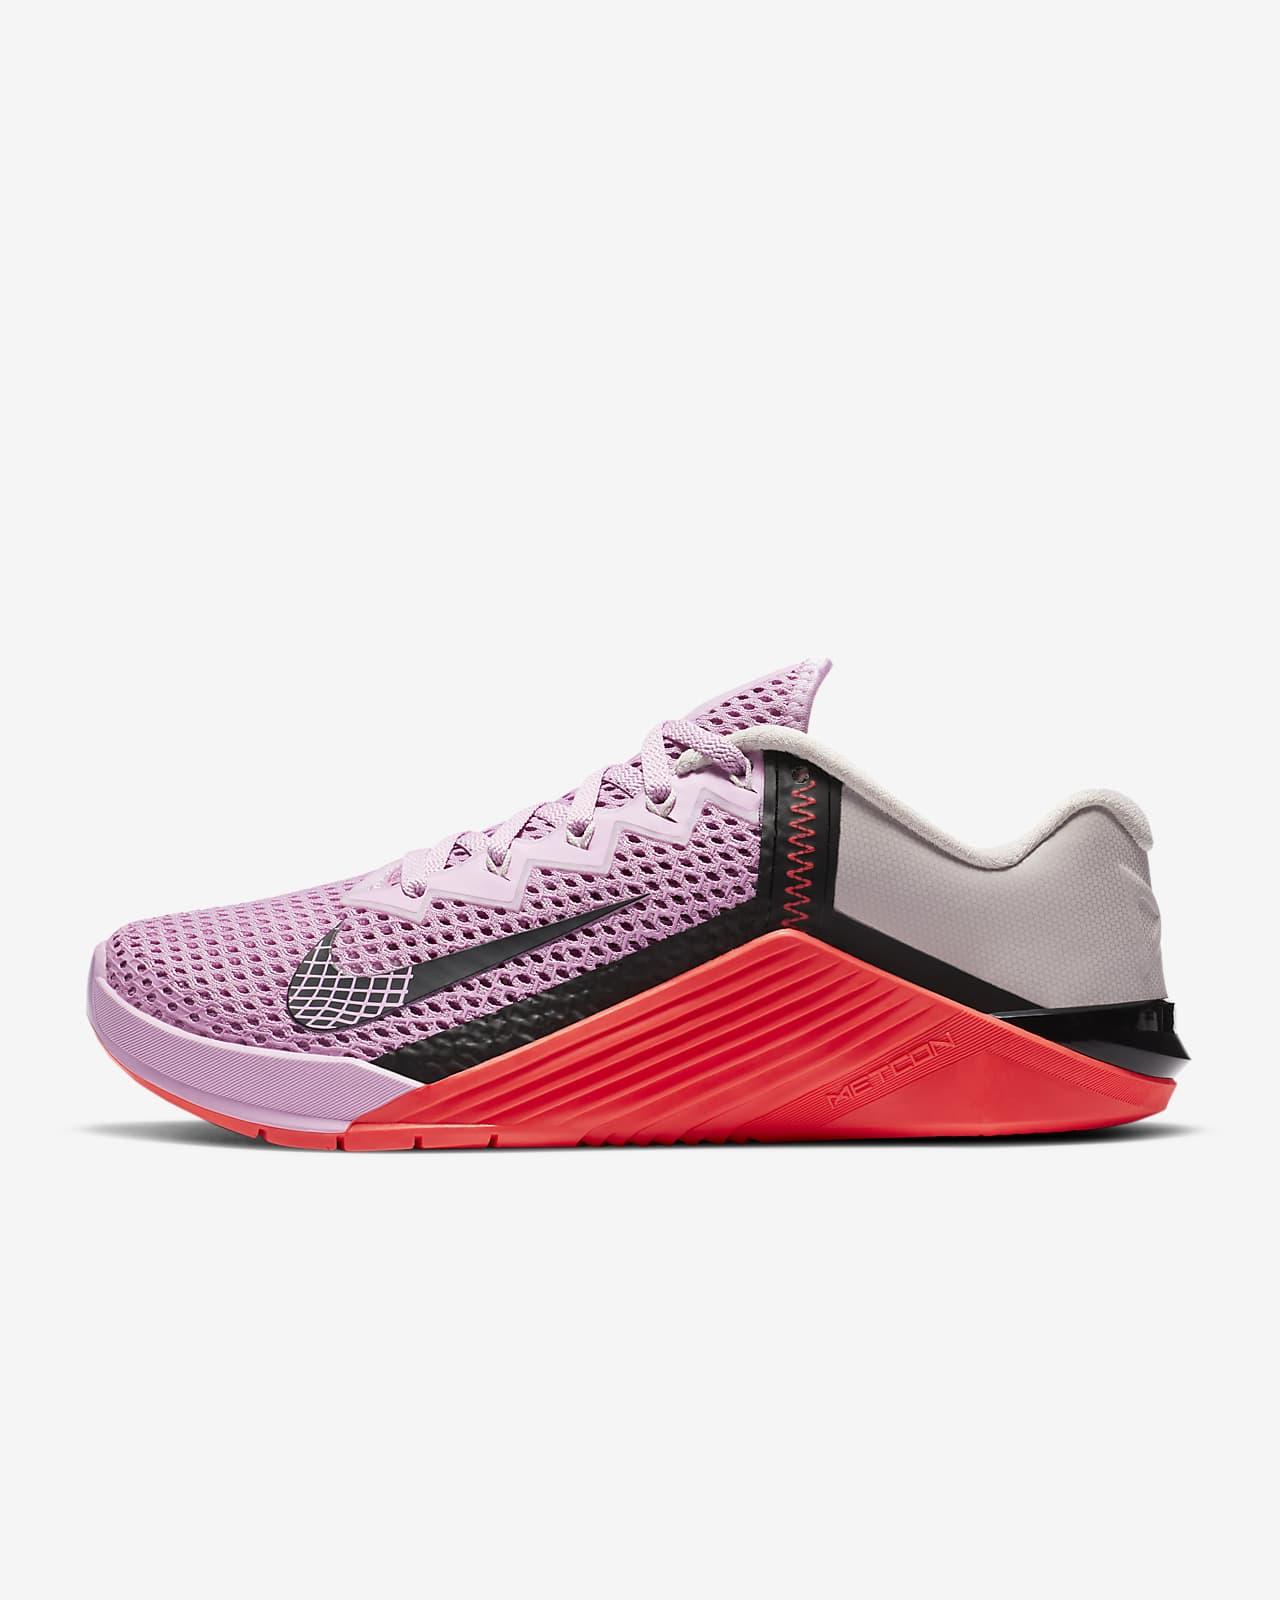 Nike Metcon 6 Damen-Trainingsschuh